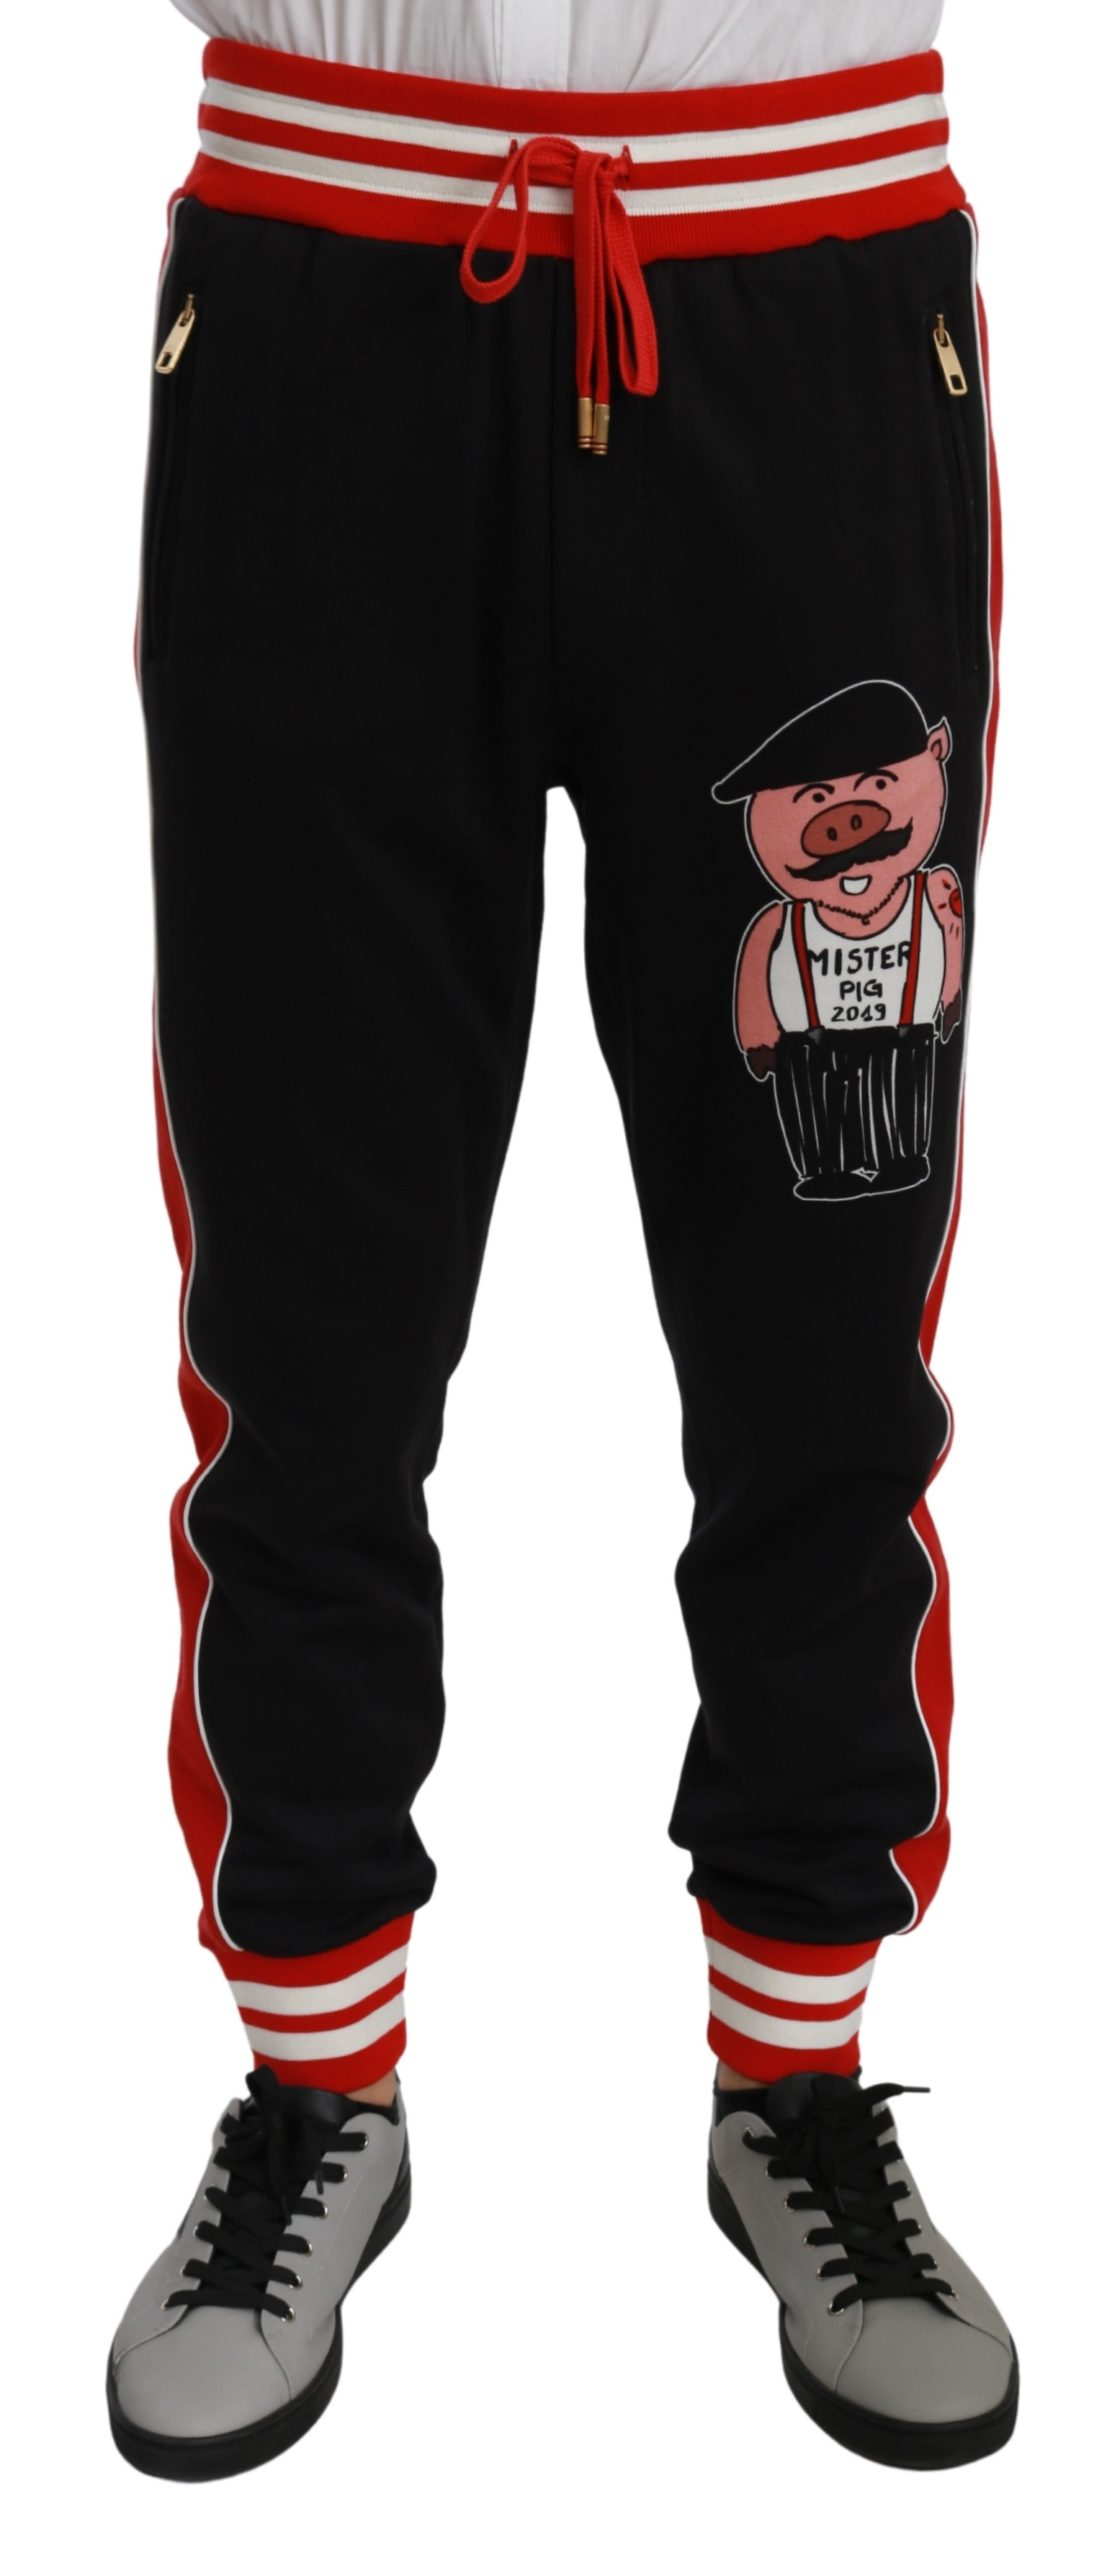 Dolce & Gabbana Men's Mister Pig Trouser Black PAN70955 - IT44 | XS